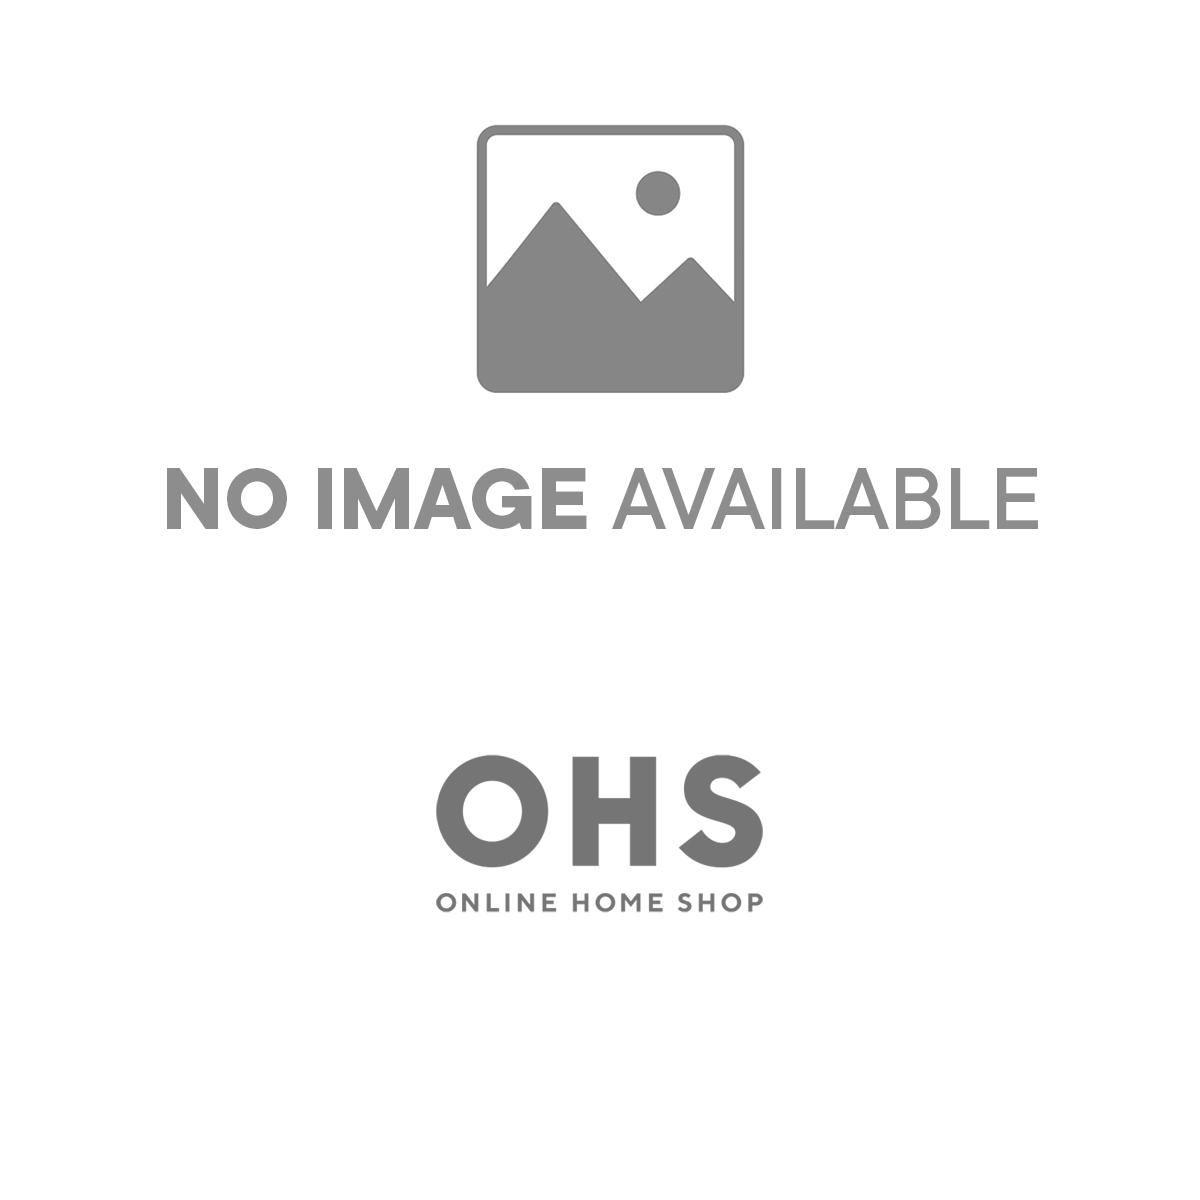 Dreamscene Stag Deer Tartan Check Christmas Duvet Cover Reversible Bedding Set - King - Grey/Red